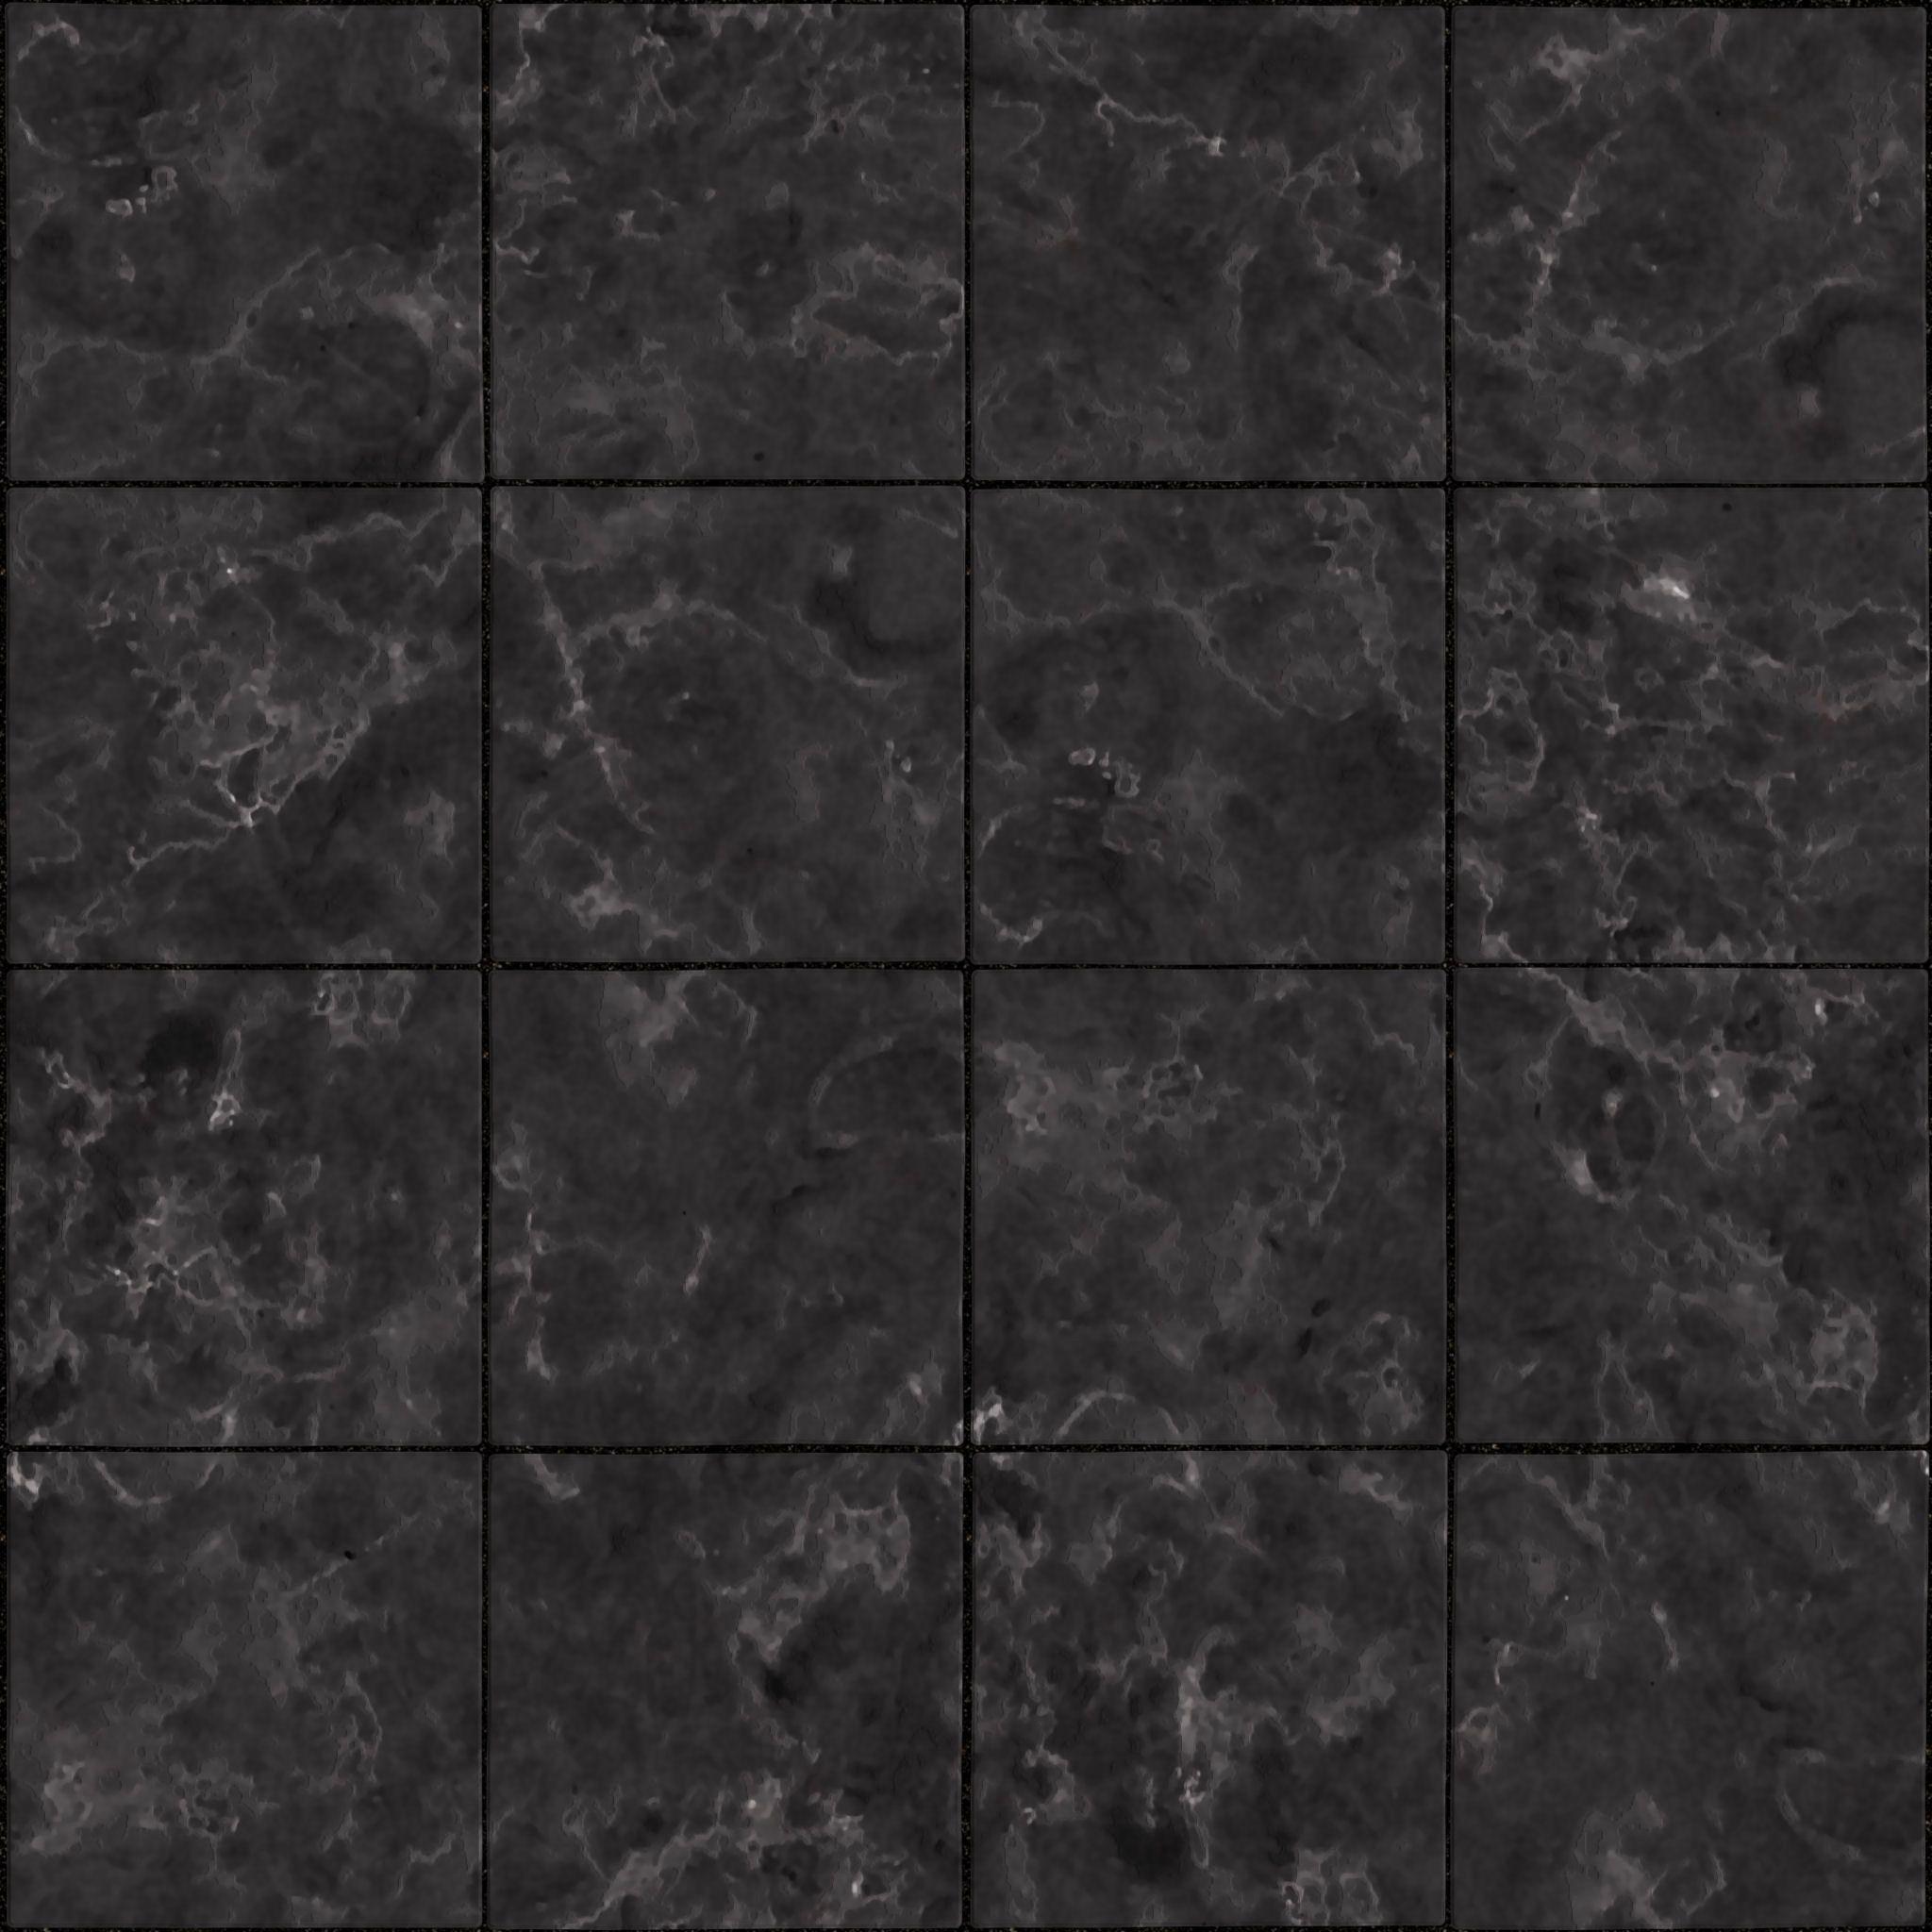 Tile Floor Texture Seamless Inspiration Decorating 315404